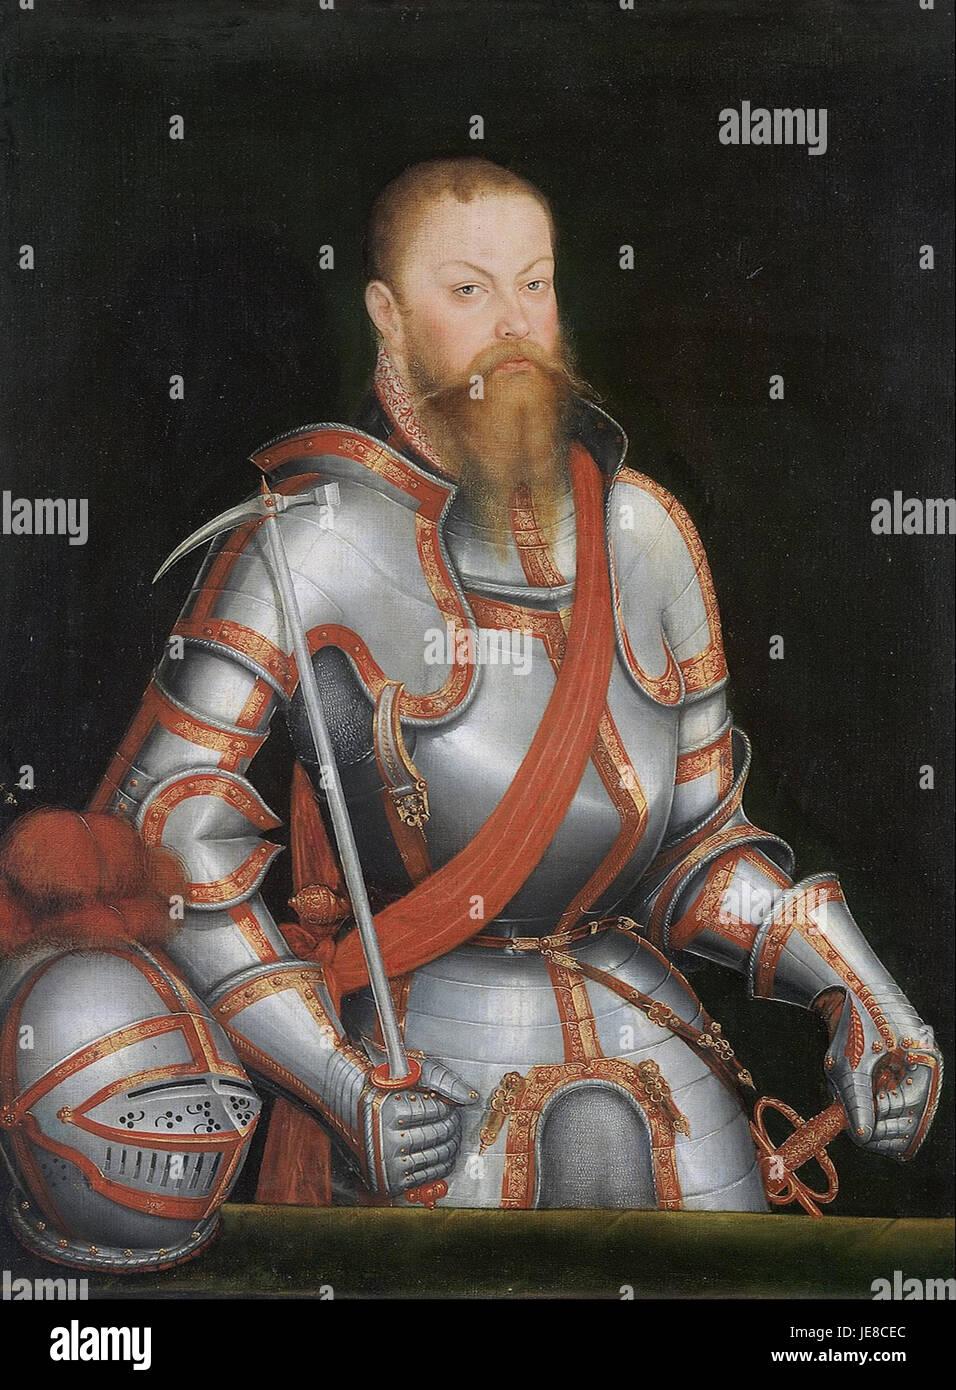 Lucas Cranach the Younger - Prince Elector Moritz of Saxony - - Stock Image